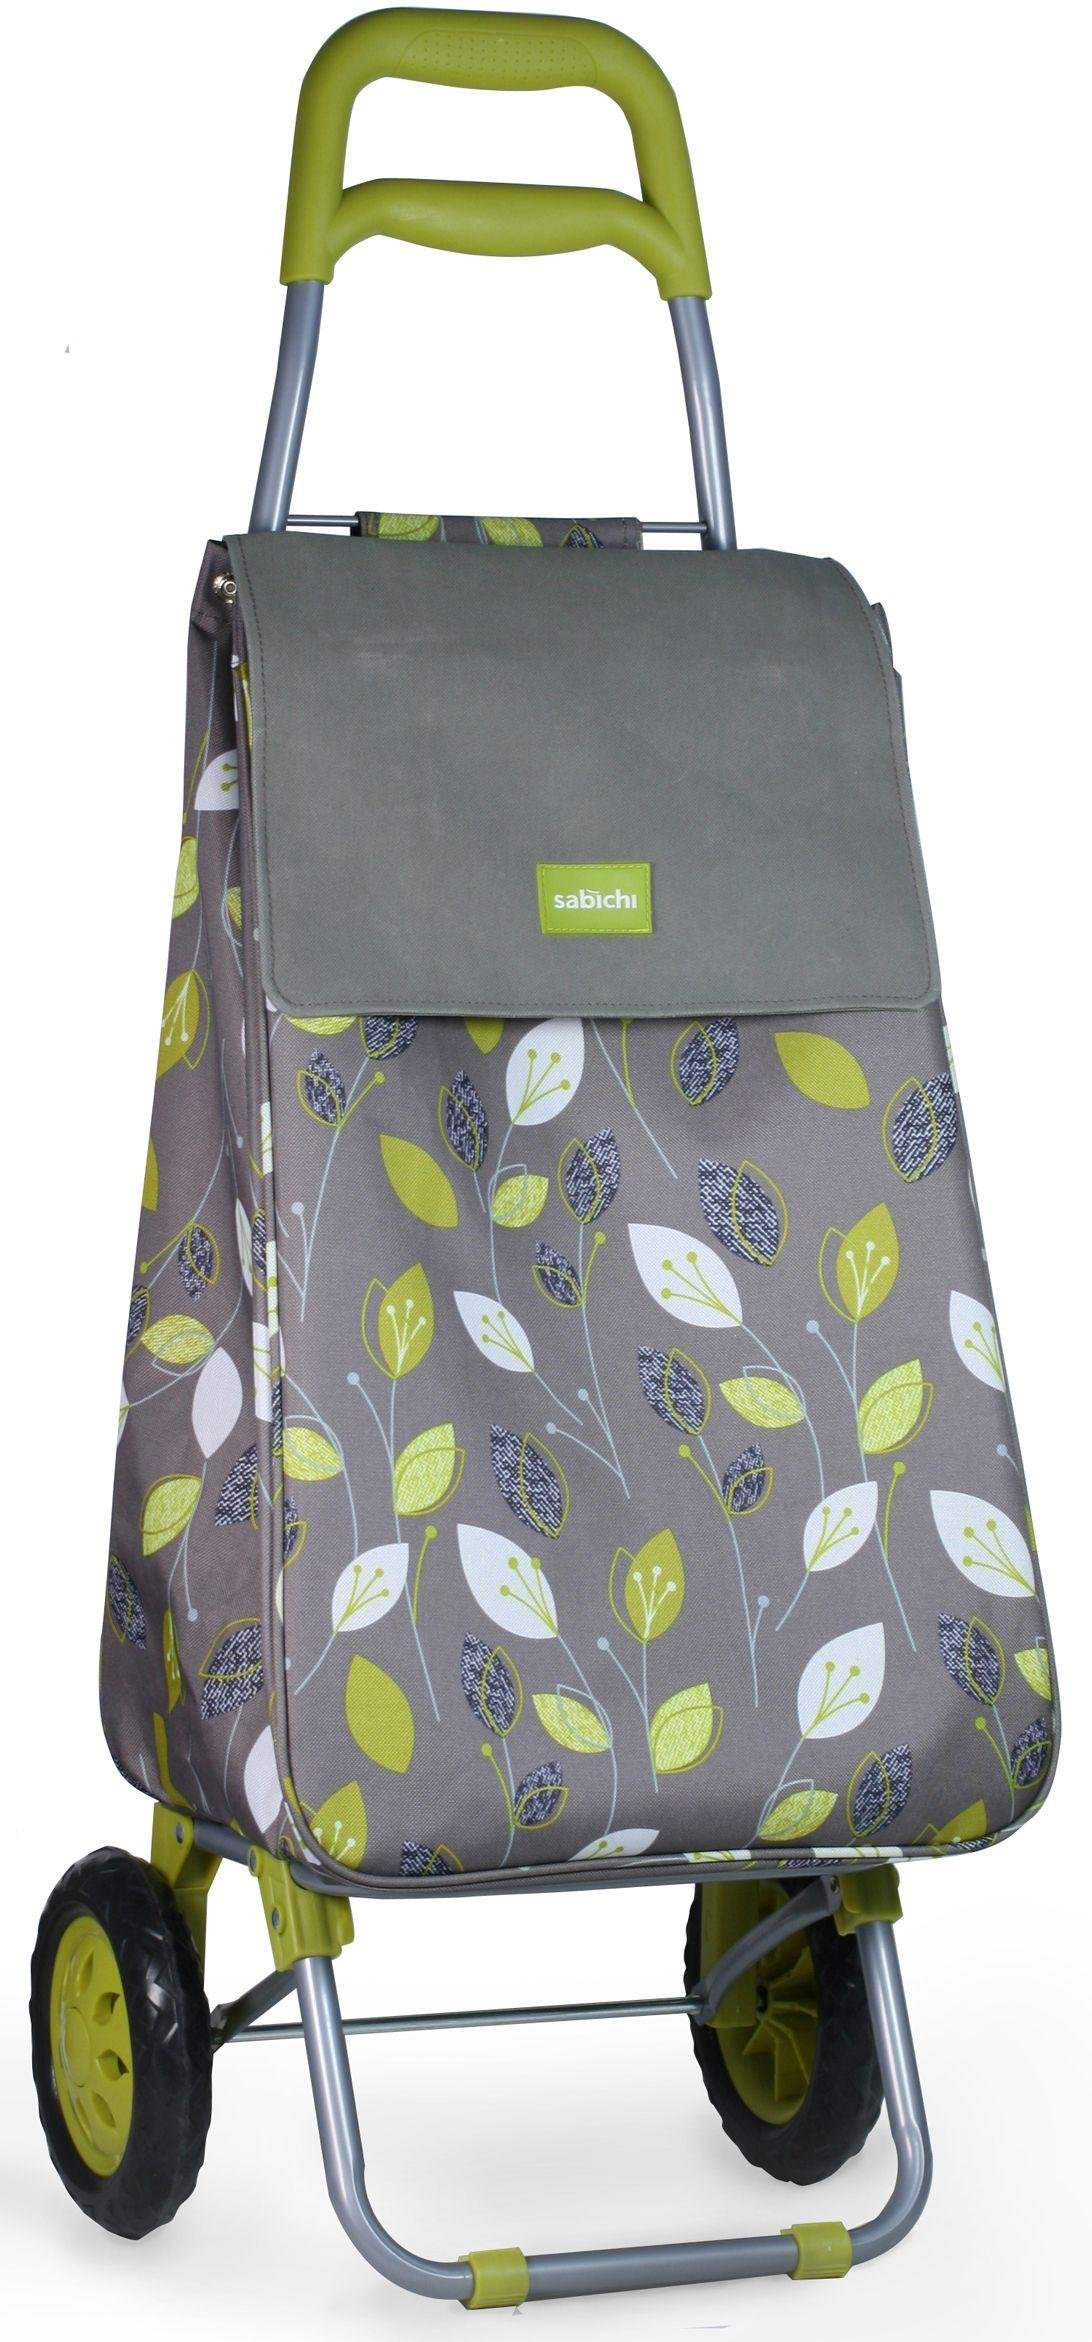 Image of Sabichi - Lemongrass Shopping Trolley